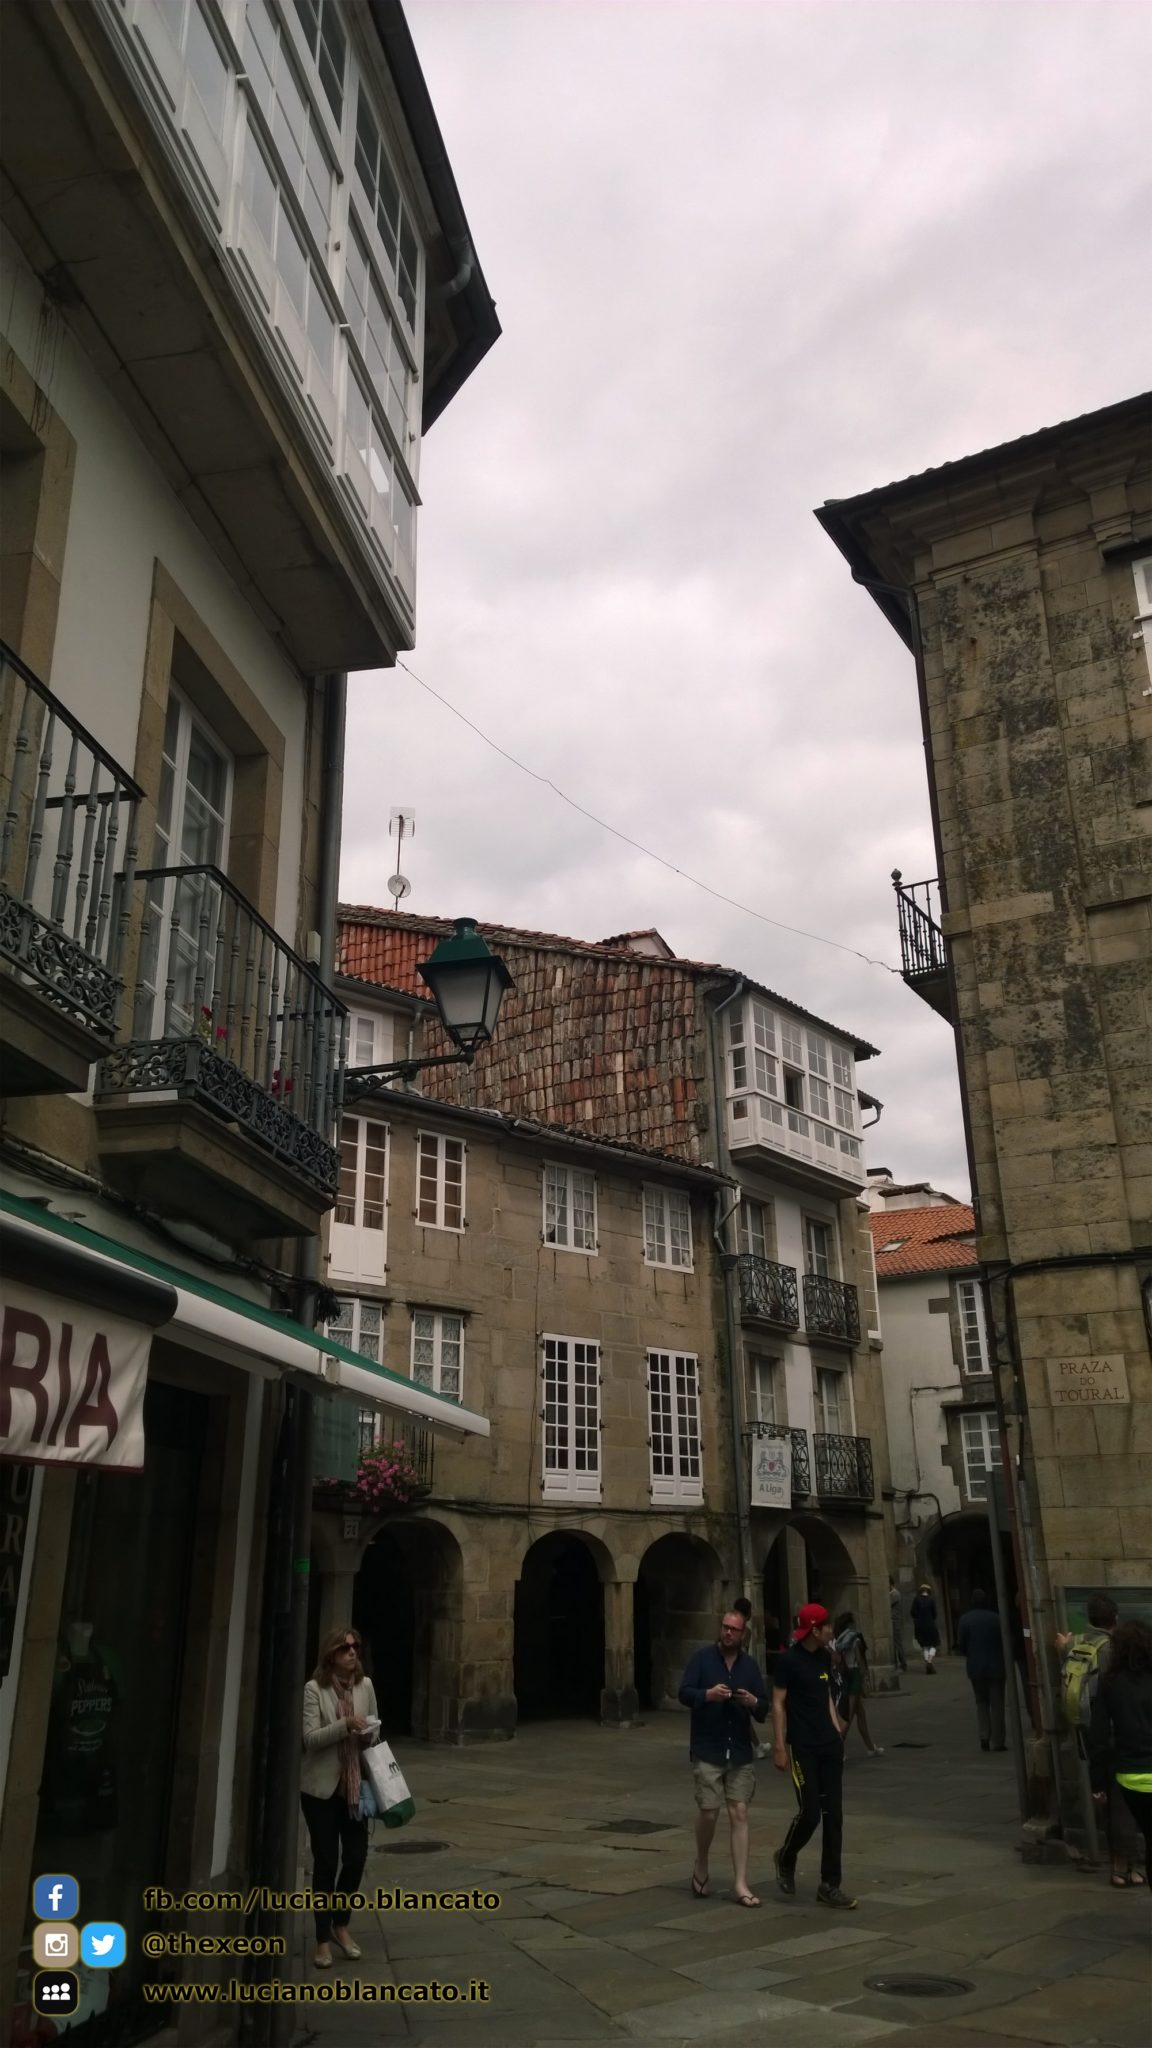 copy_Santiago de Compostela - in giro per il centro storico